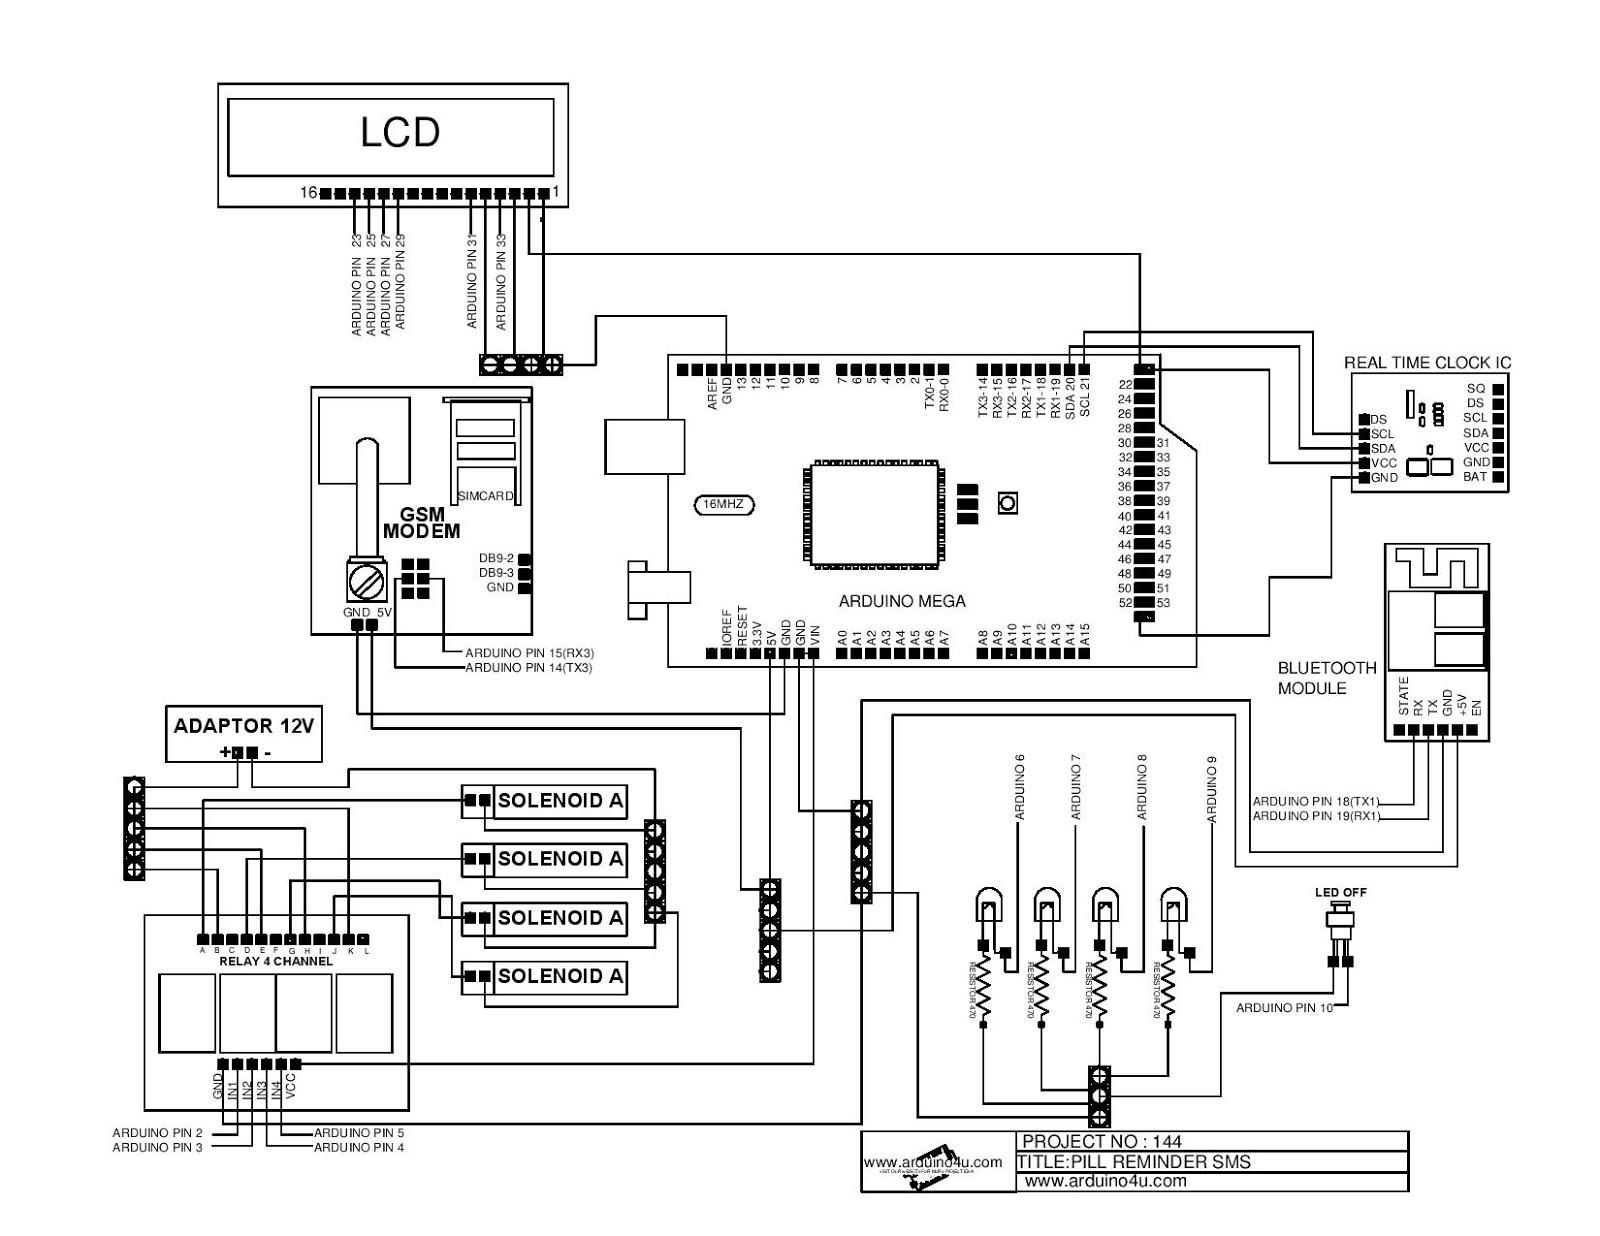 Projek Elektronik Arduino4u 144 Pil Reminder Sms